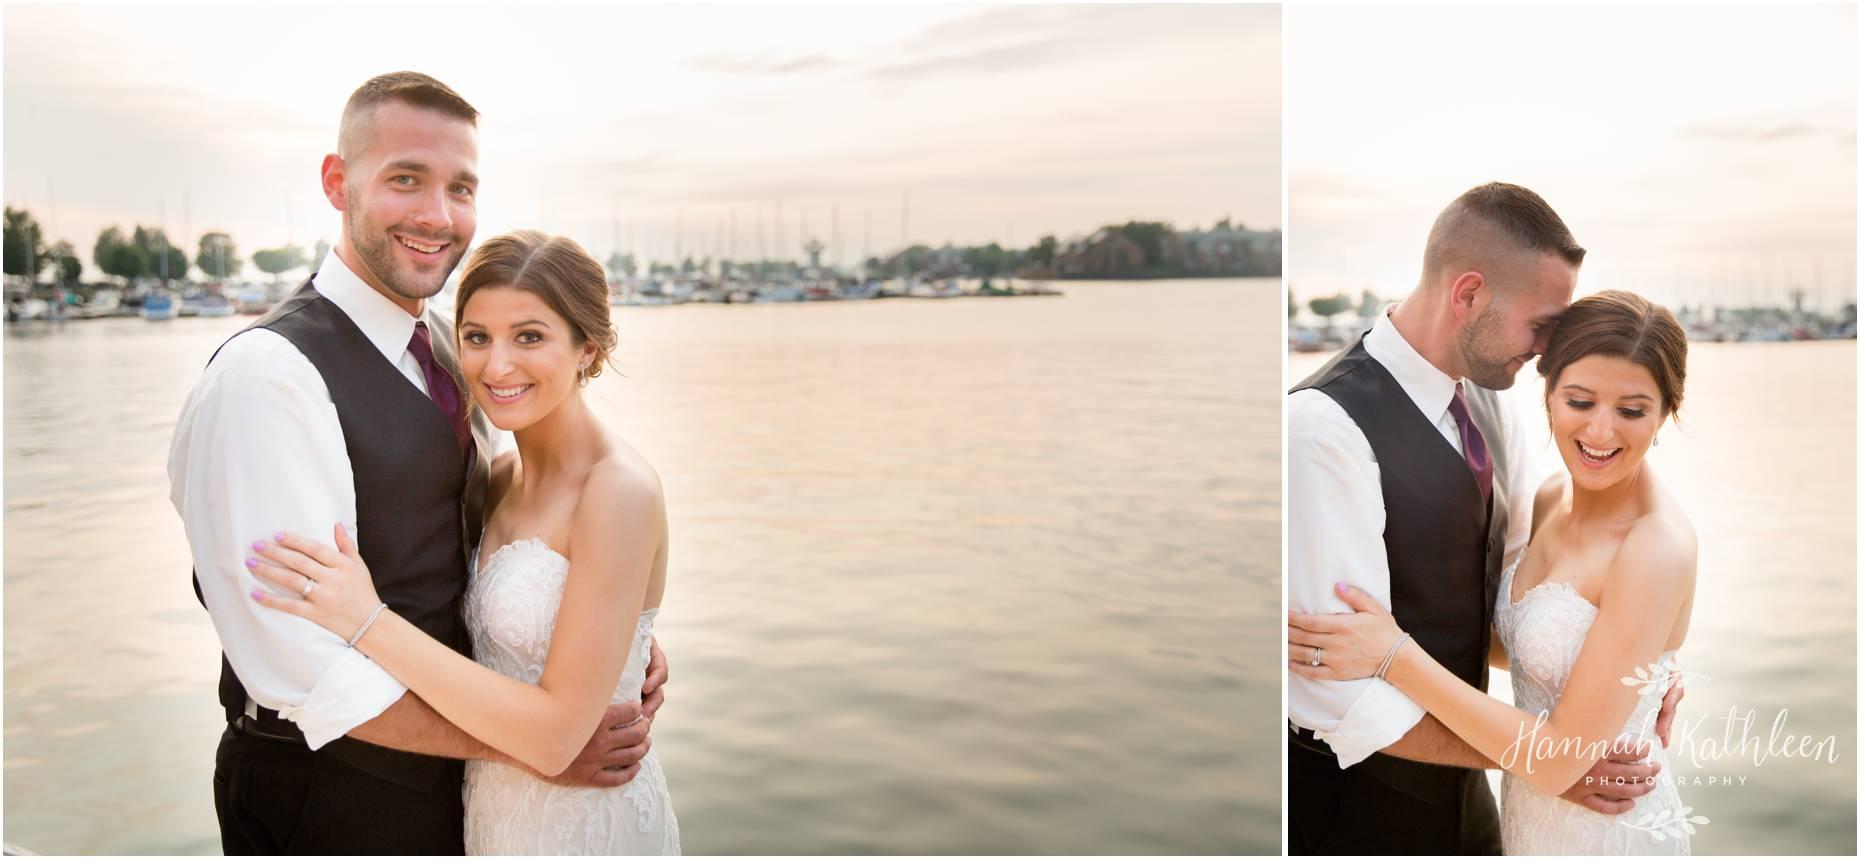 Buffalo_NY_Wedding_Photography_Ryan_Nikki